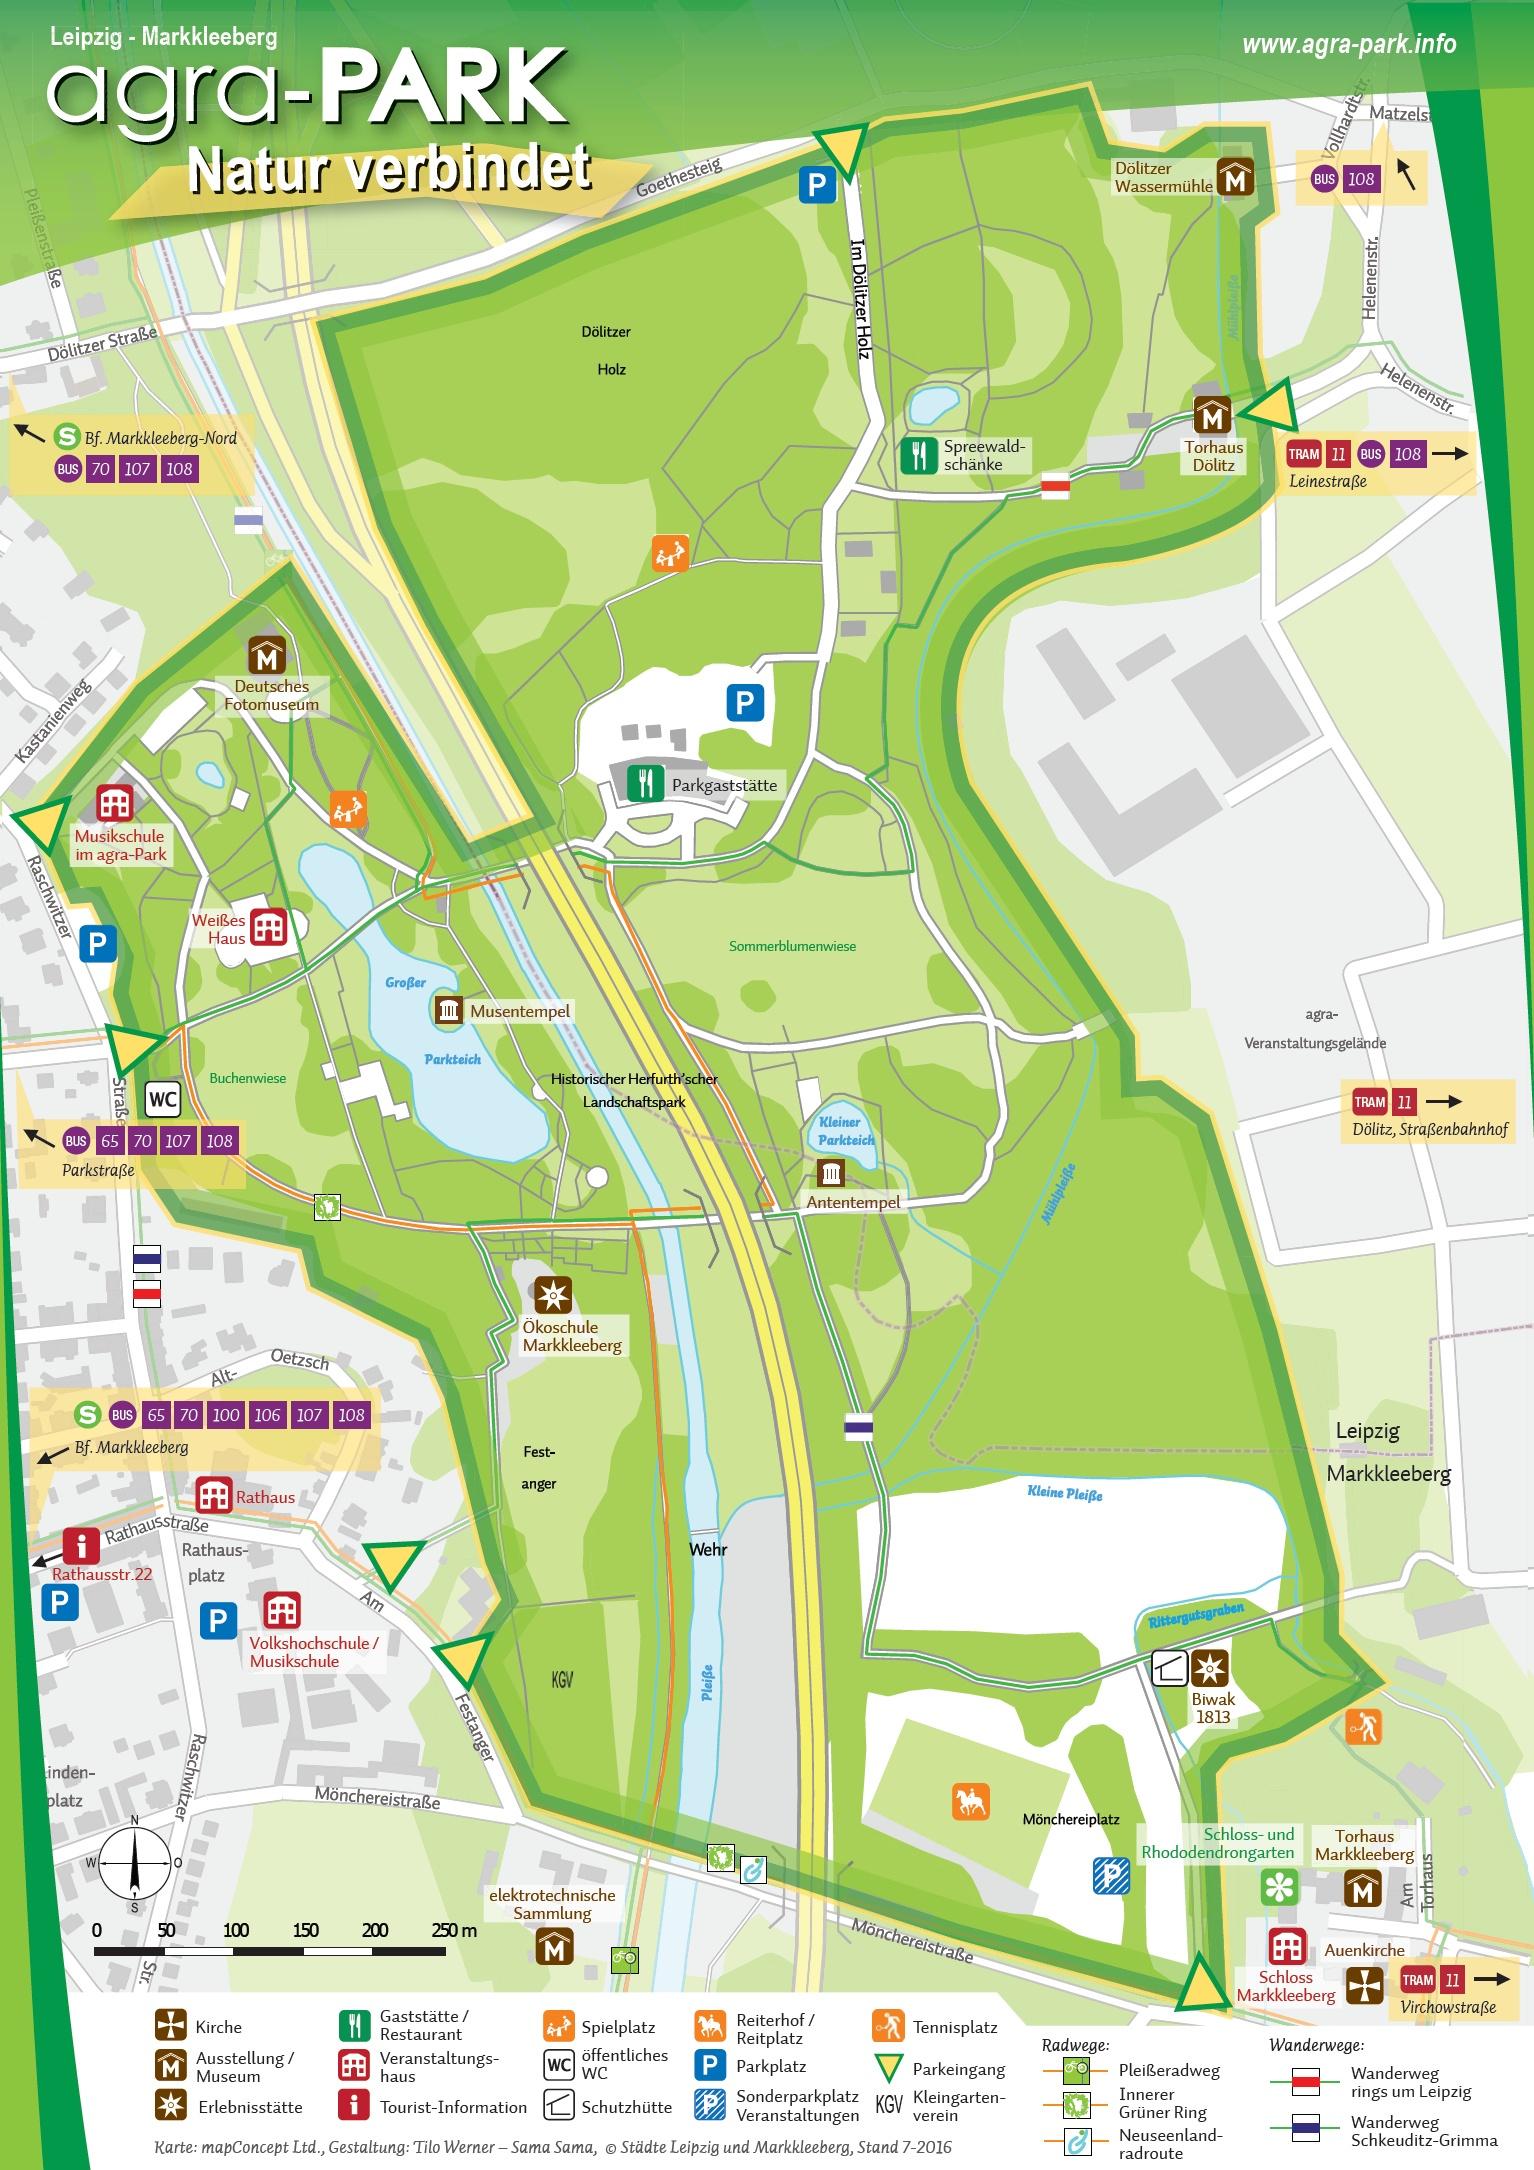 agra-Park Plan